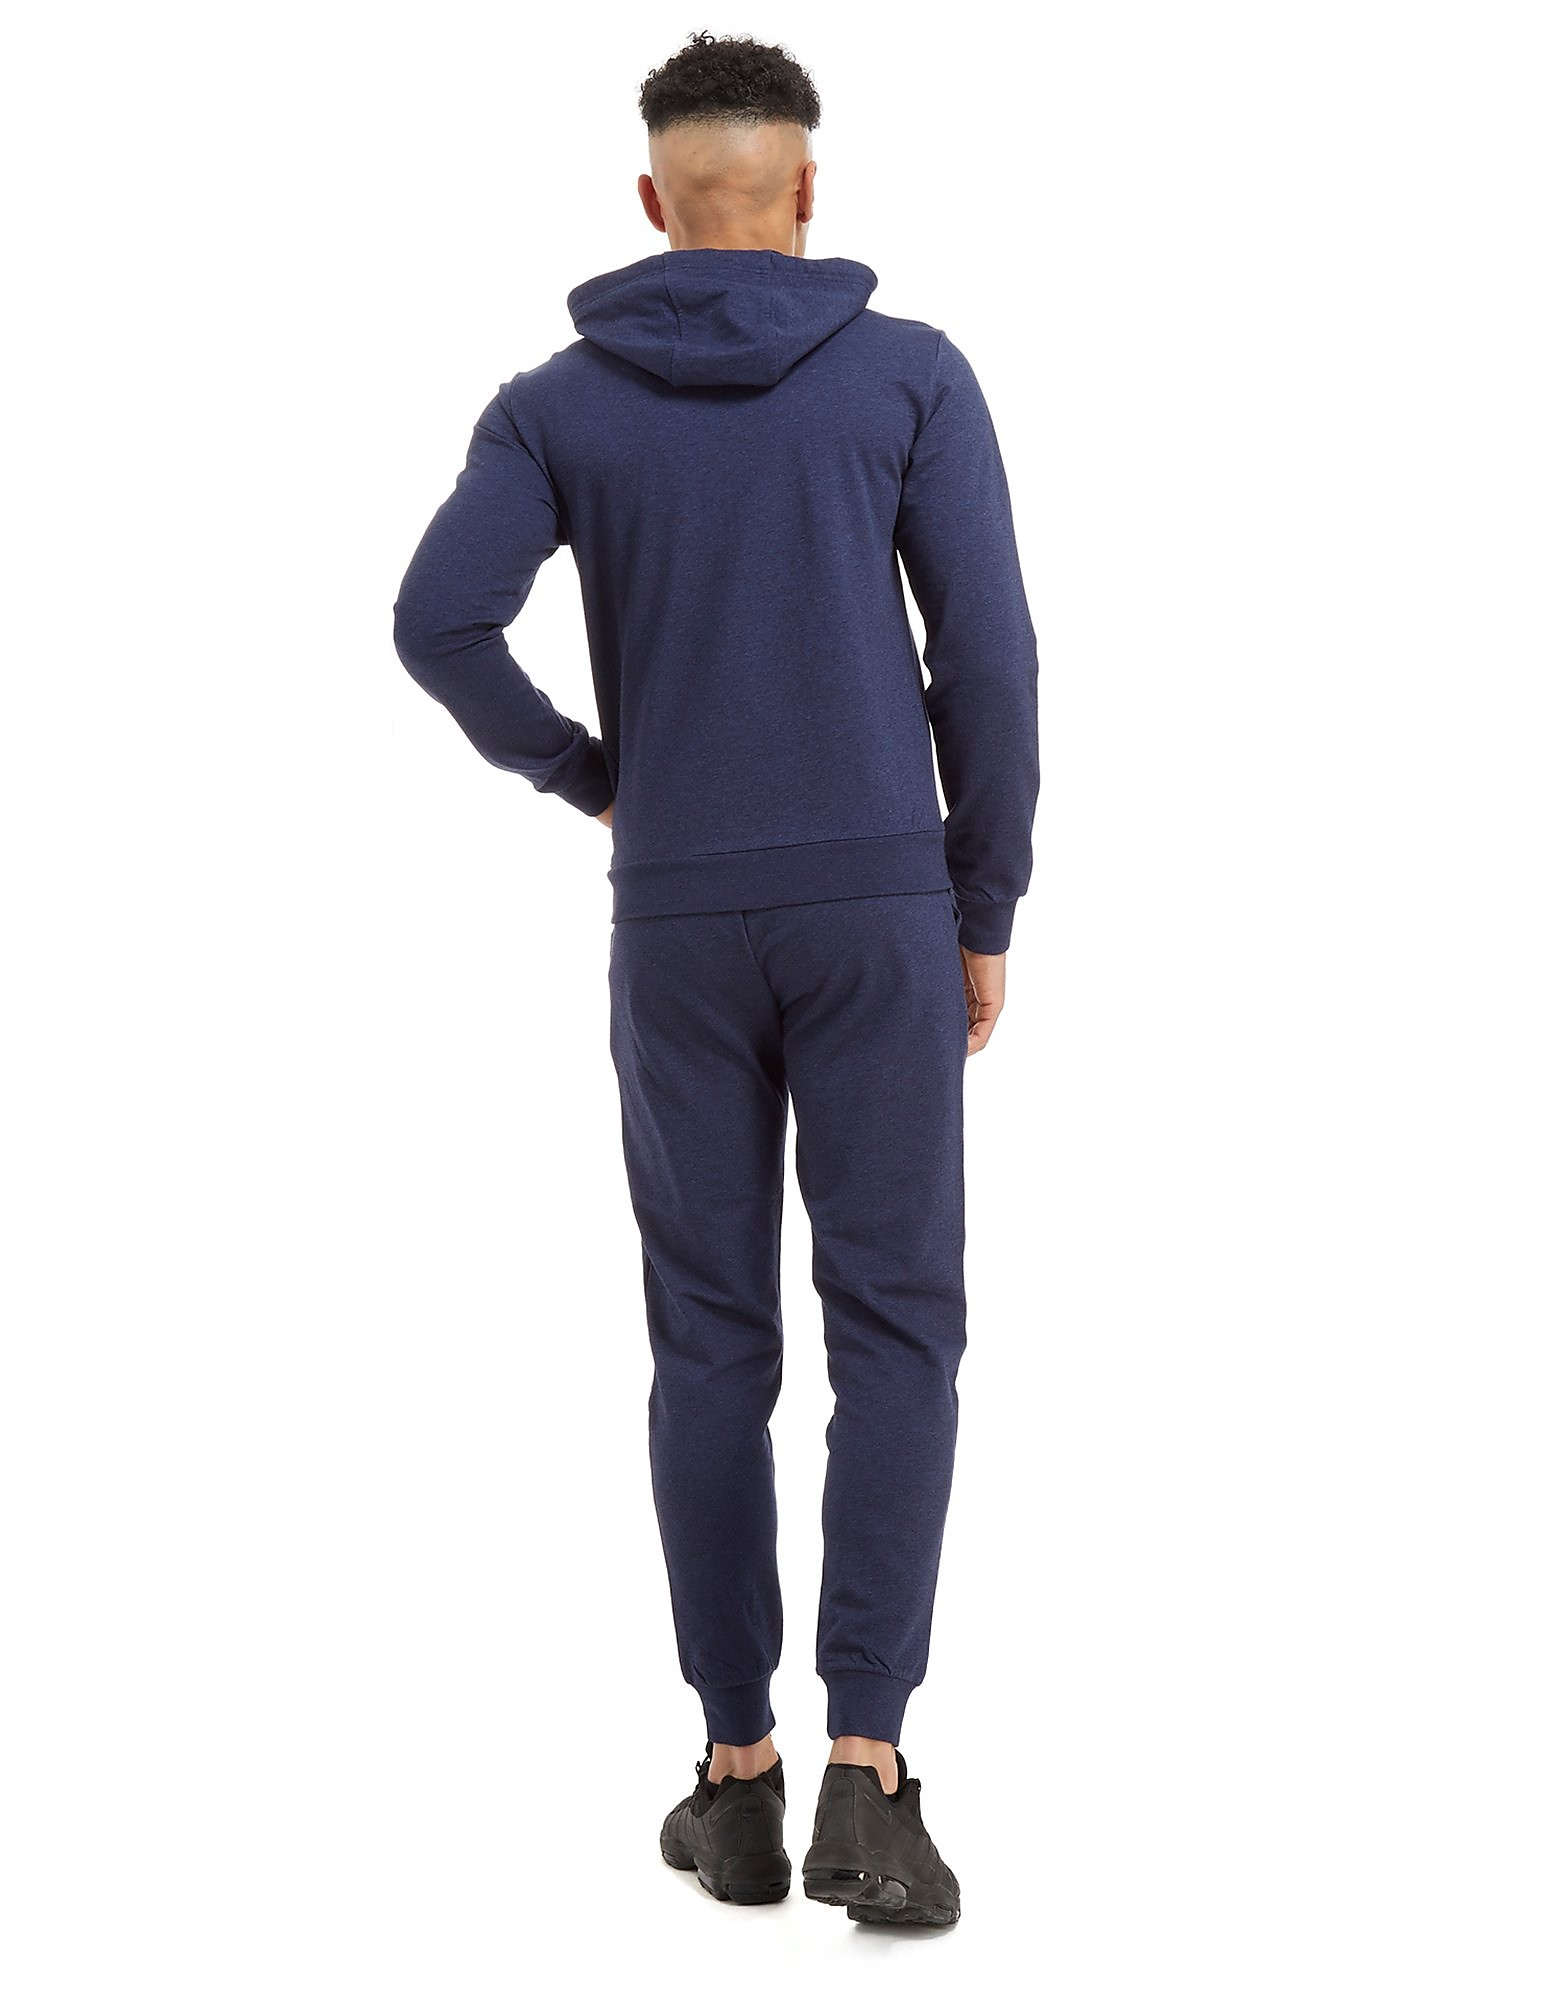 Emporio Armani EA7 Hooded Visibility Suit